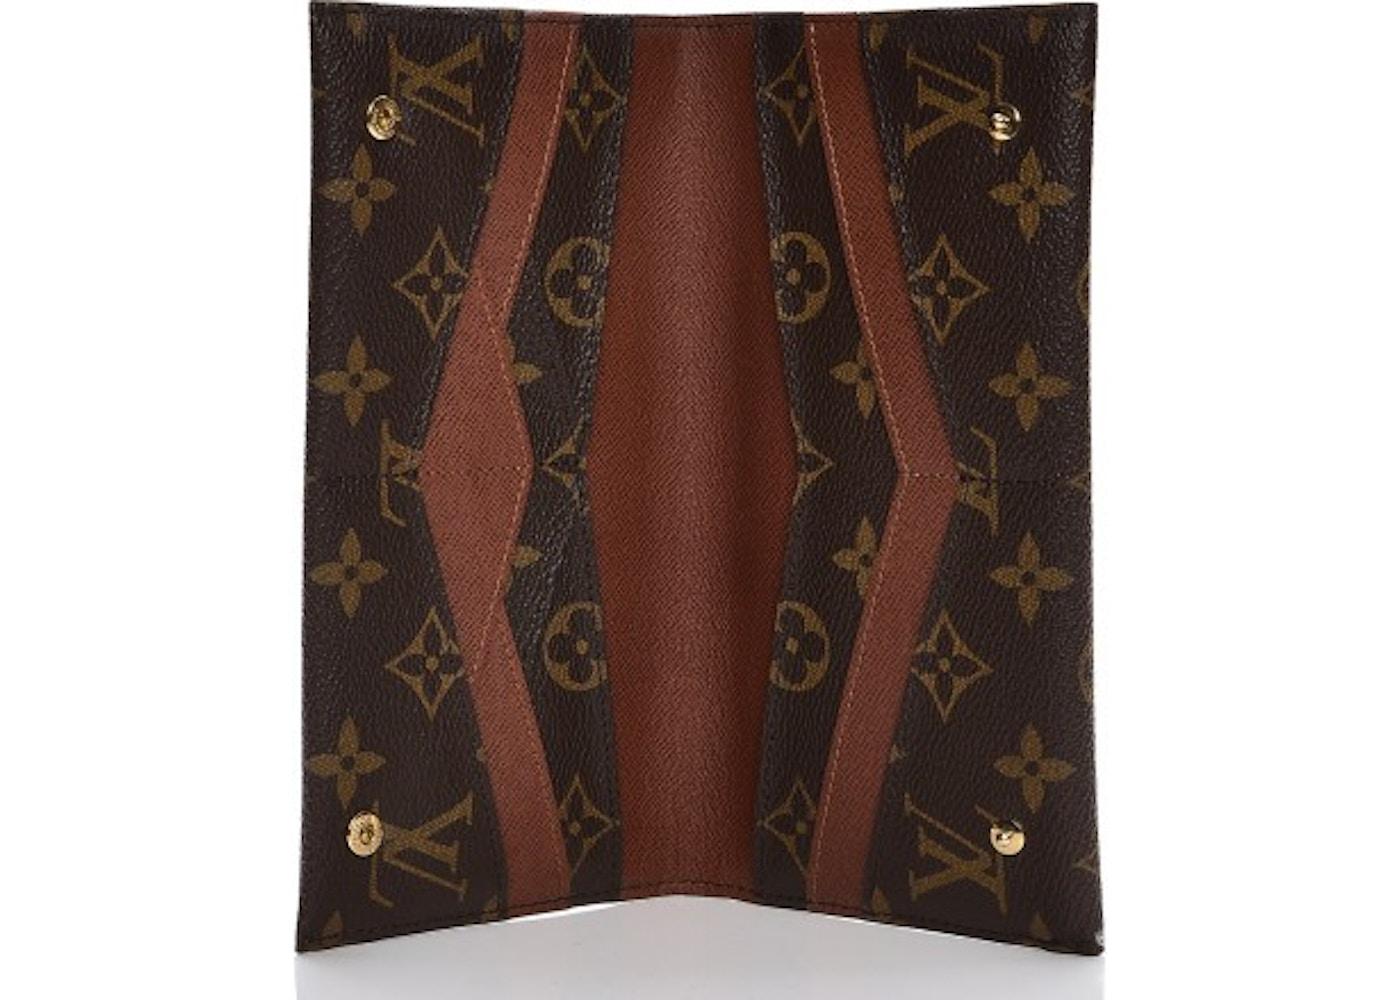 Louis Vuitton Long Wallet Origami Monogram